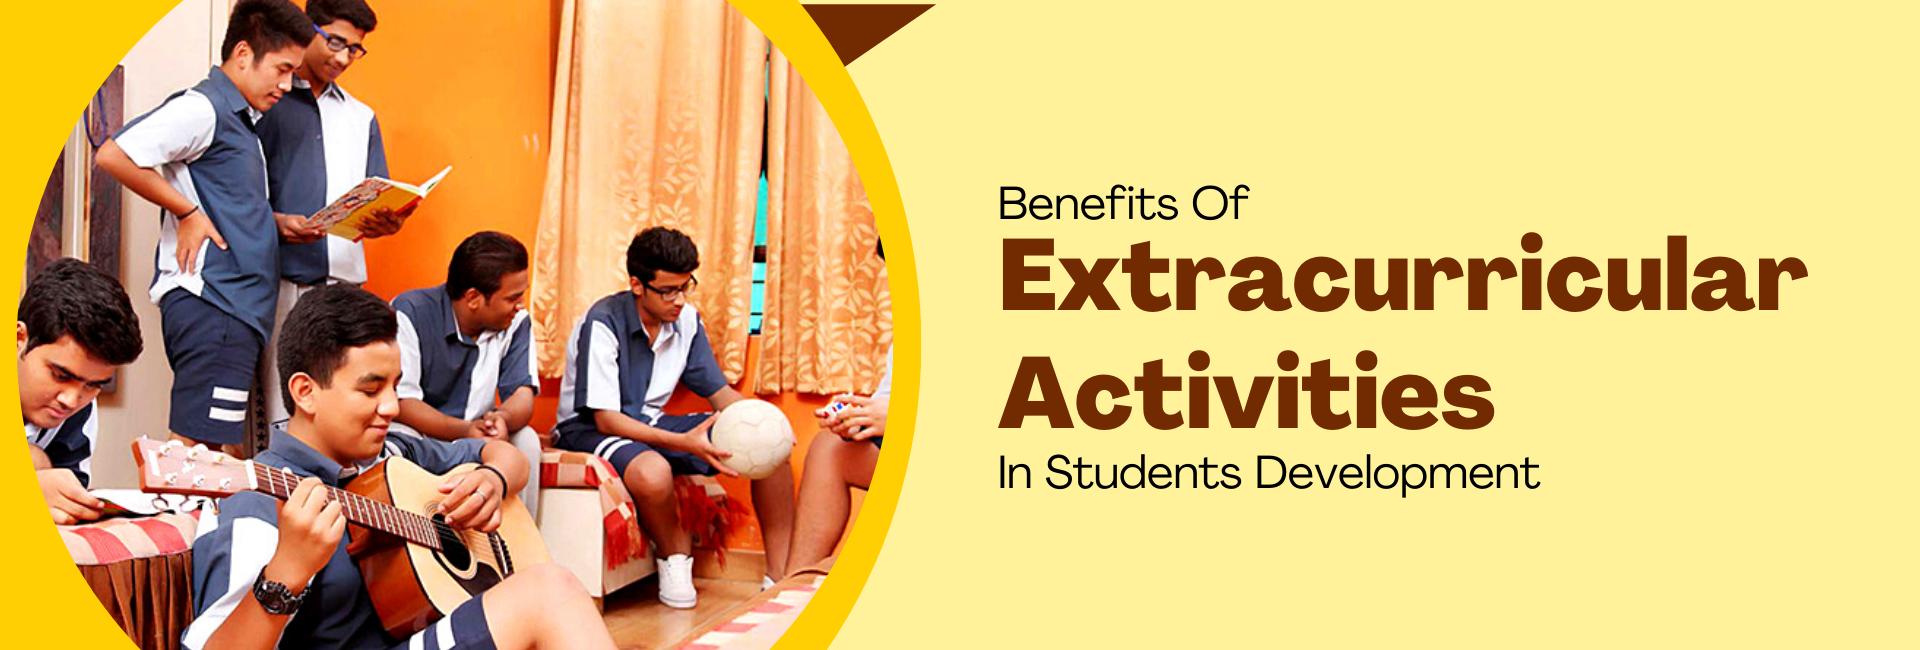 Benefits Of Extracurricular Activities In Students Development-featured image